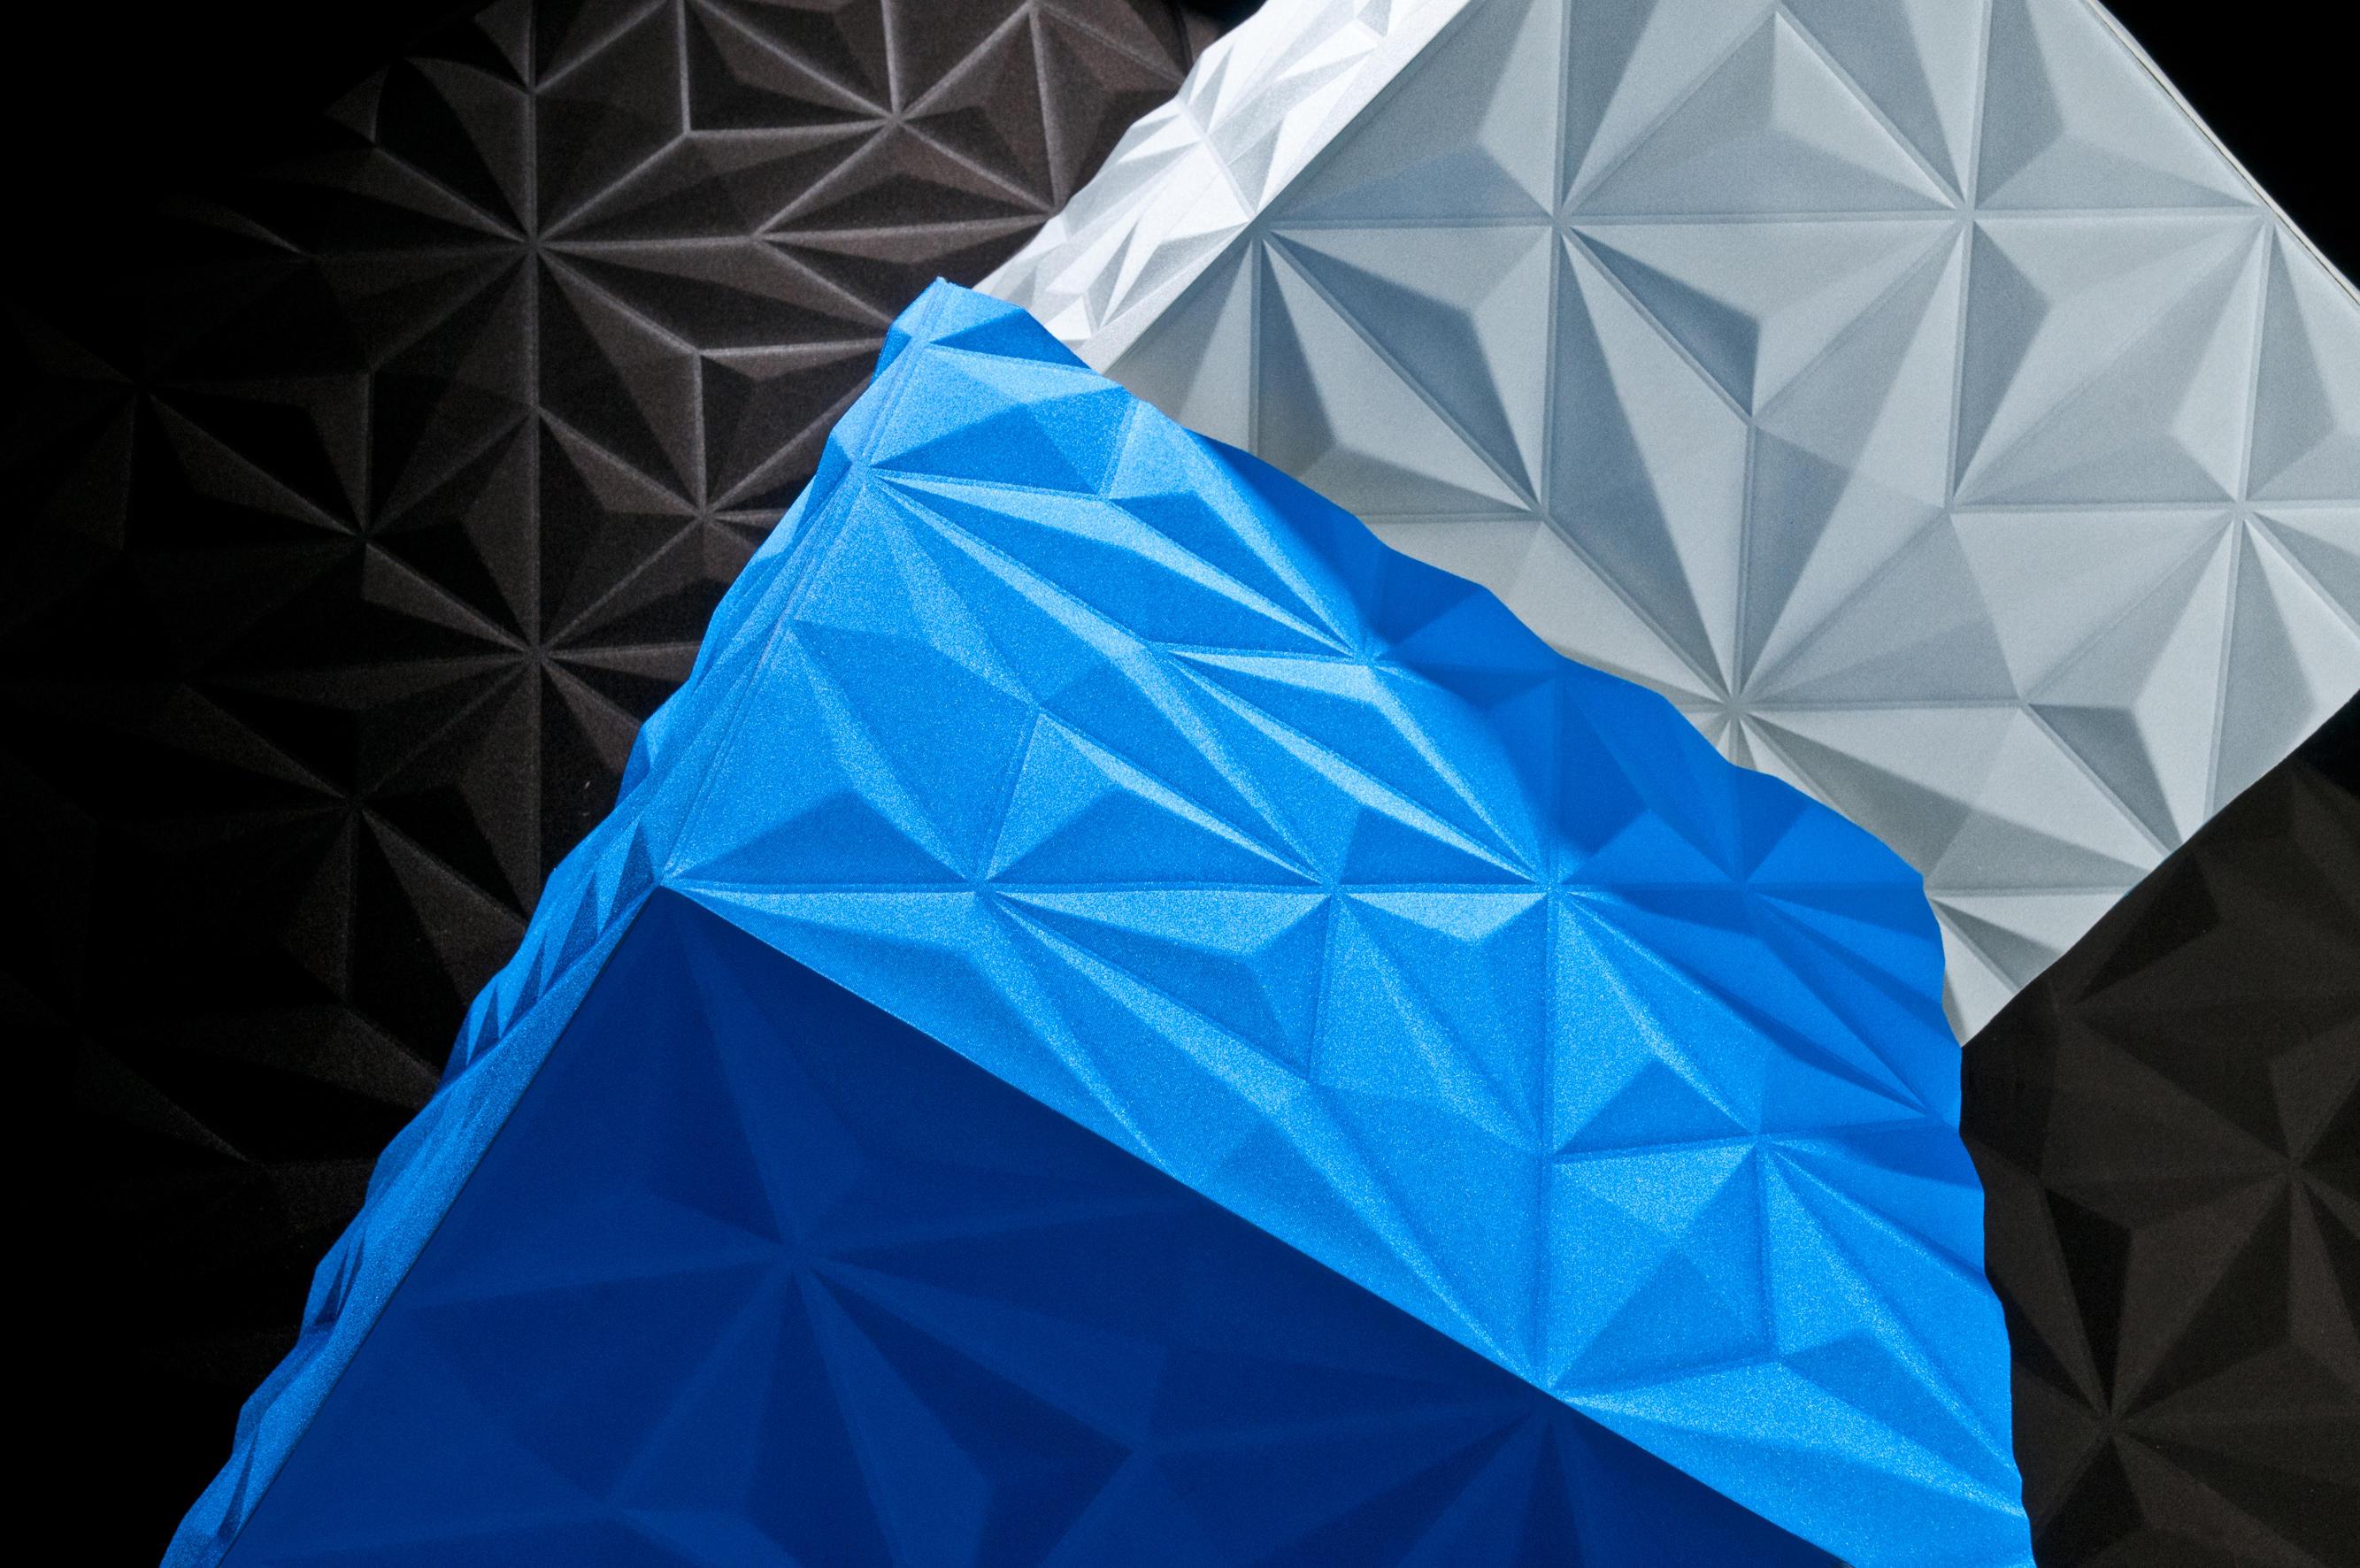 Intrigue Rosace & Designermöbel | Architonic à Image De Rosace